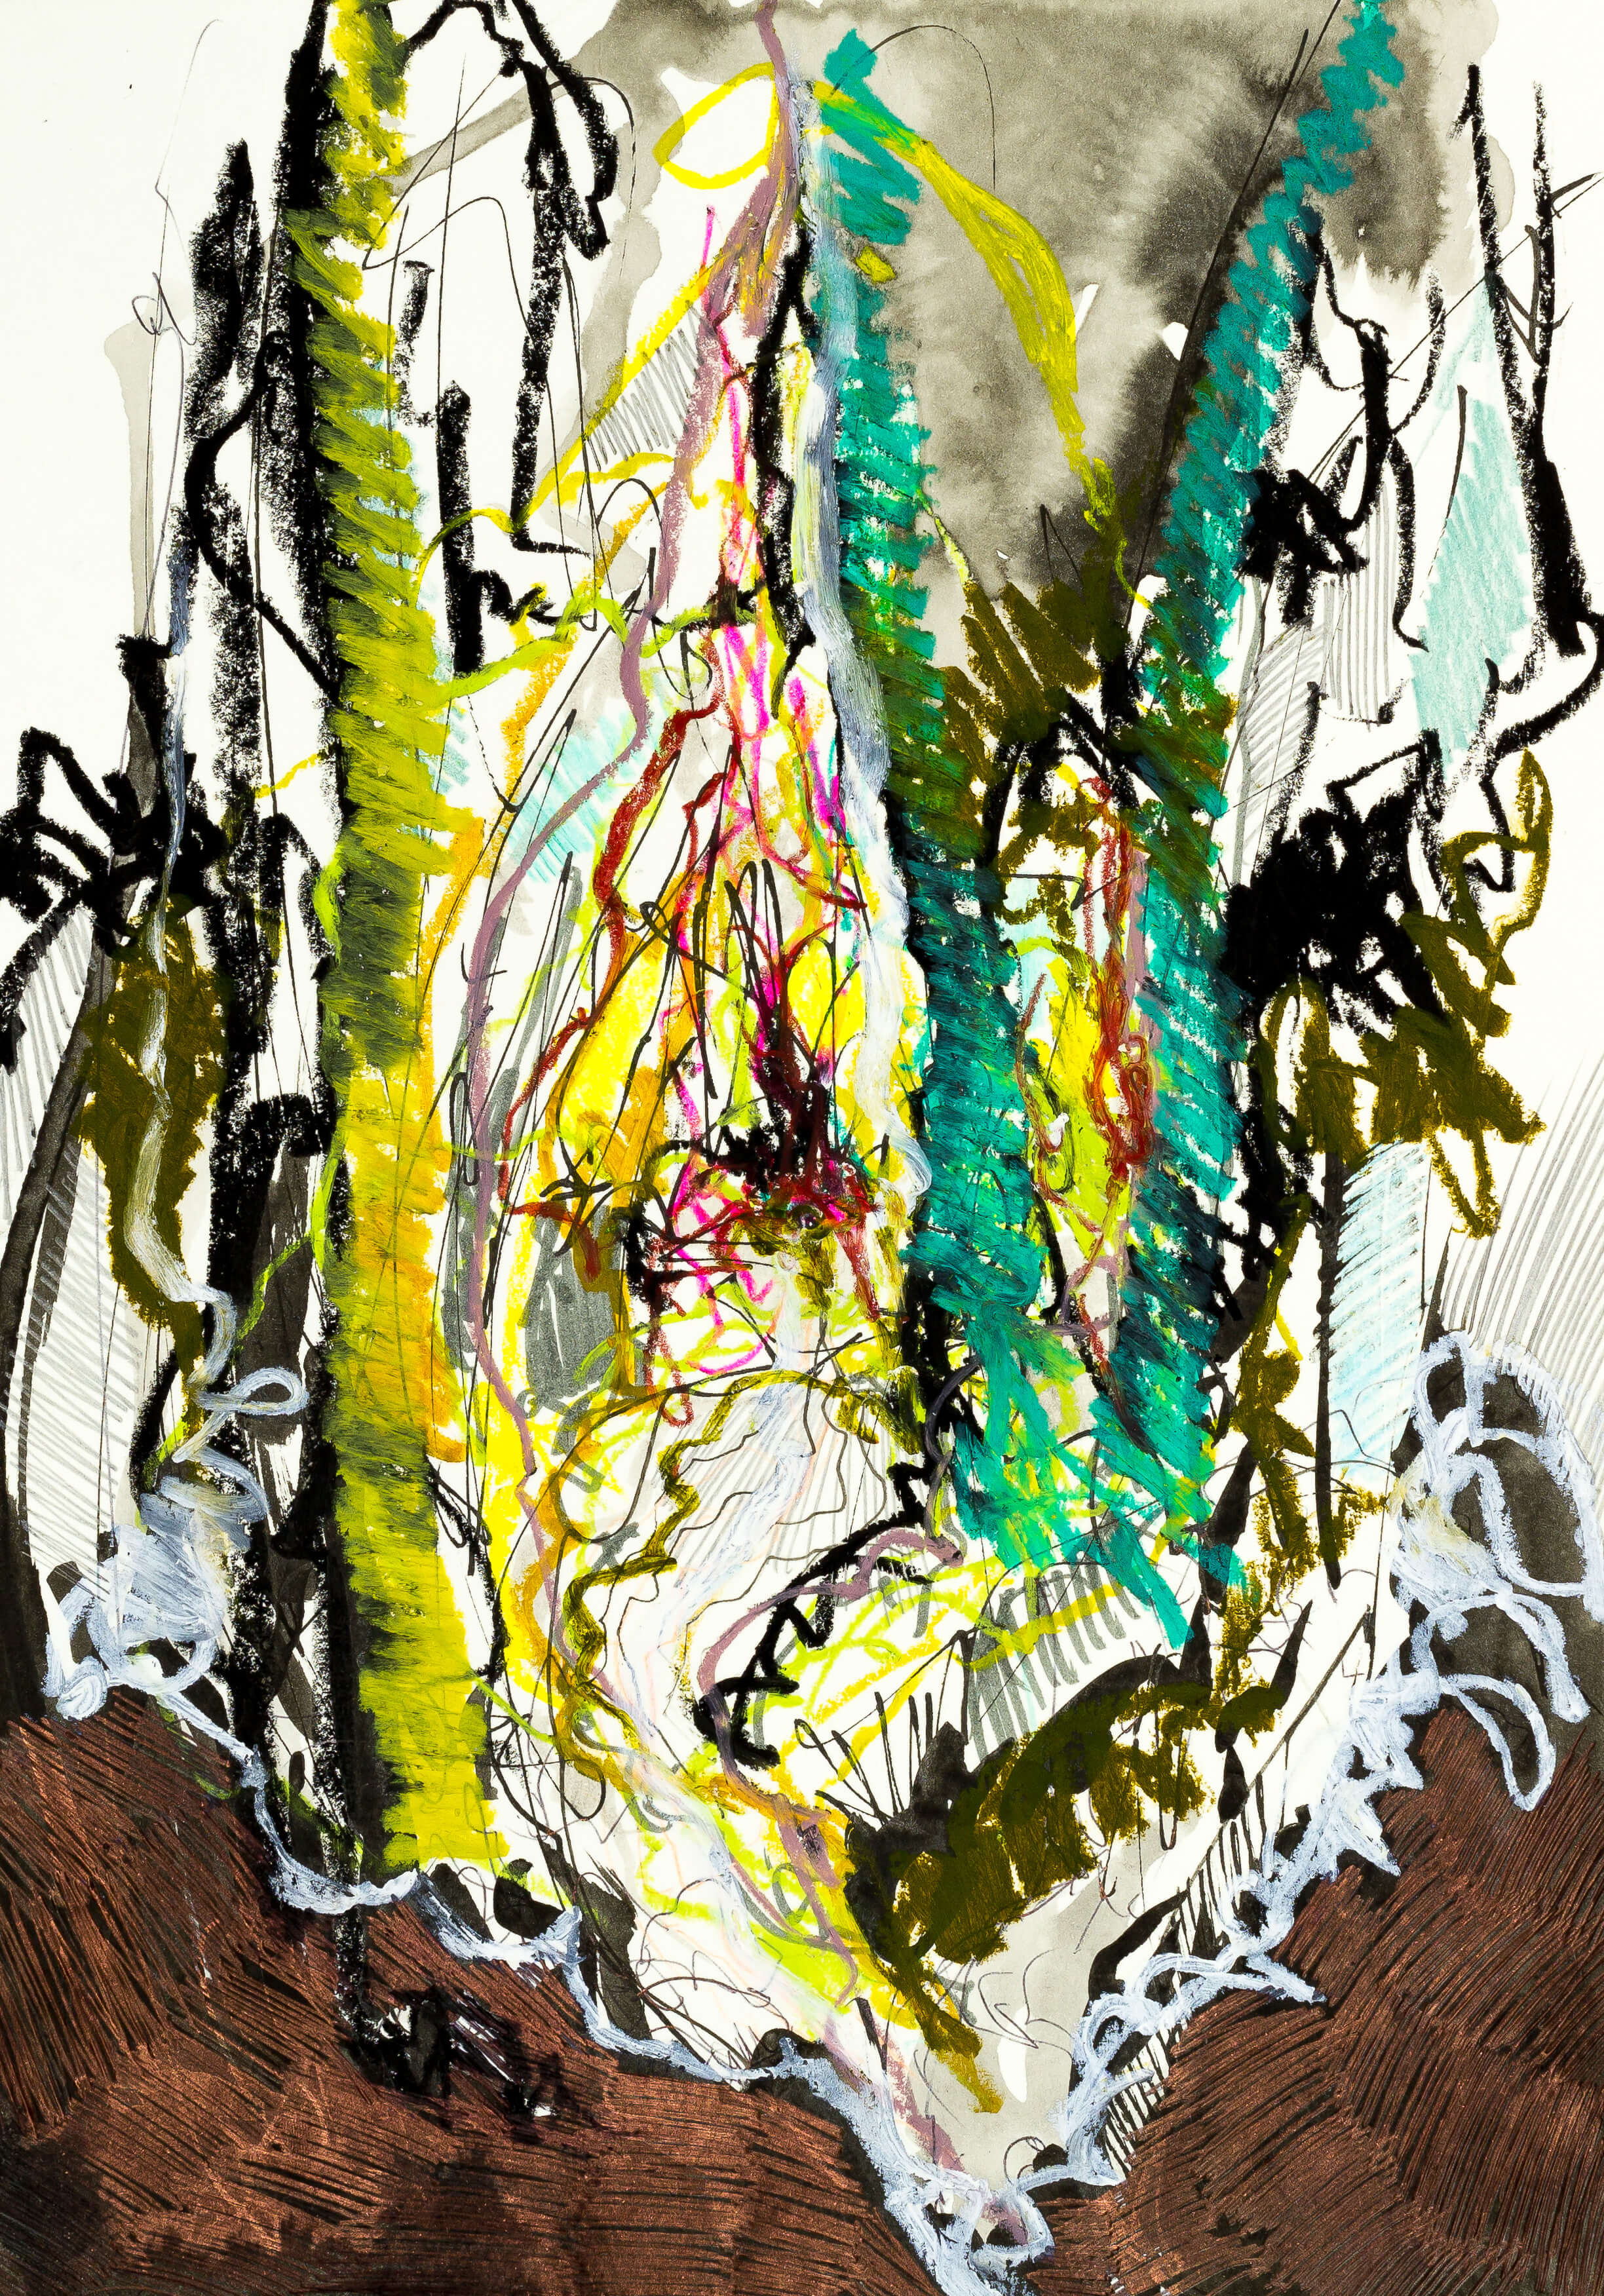 Katharina Albers, Wald XXXVIII, 2016, Ölkreide, Fineliner, Gelstift, Buntstift, Aquarell auf Papier, 29,7x21 cm